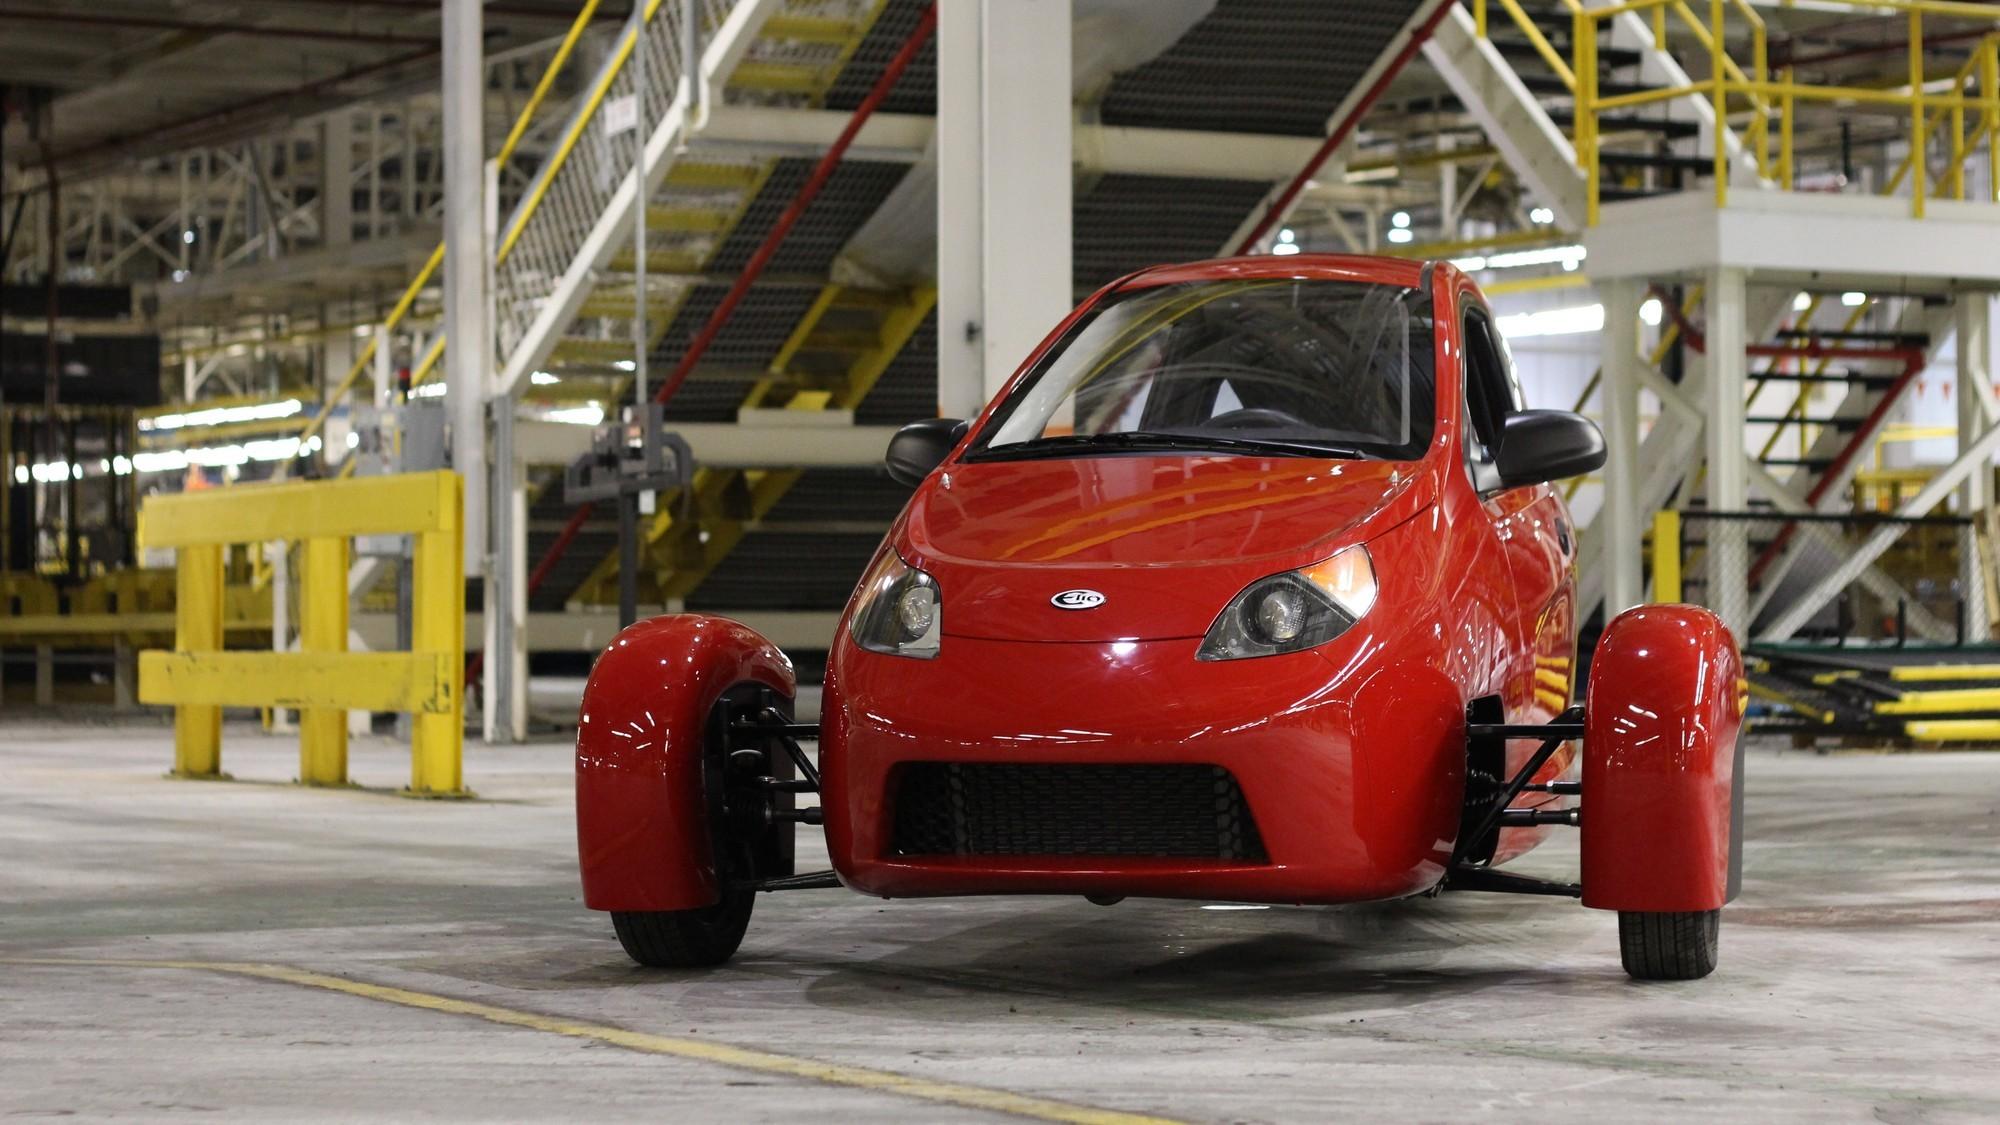 Elio-E: американский трицикл-долгострой перешёл на электричество